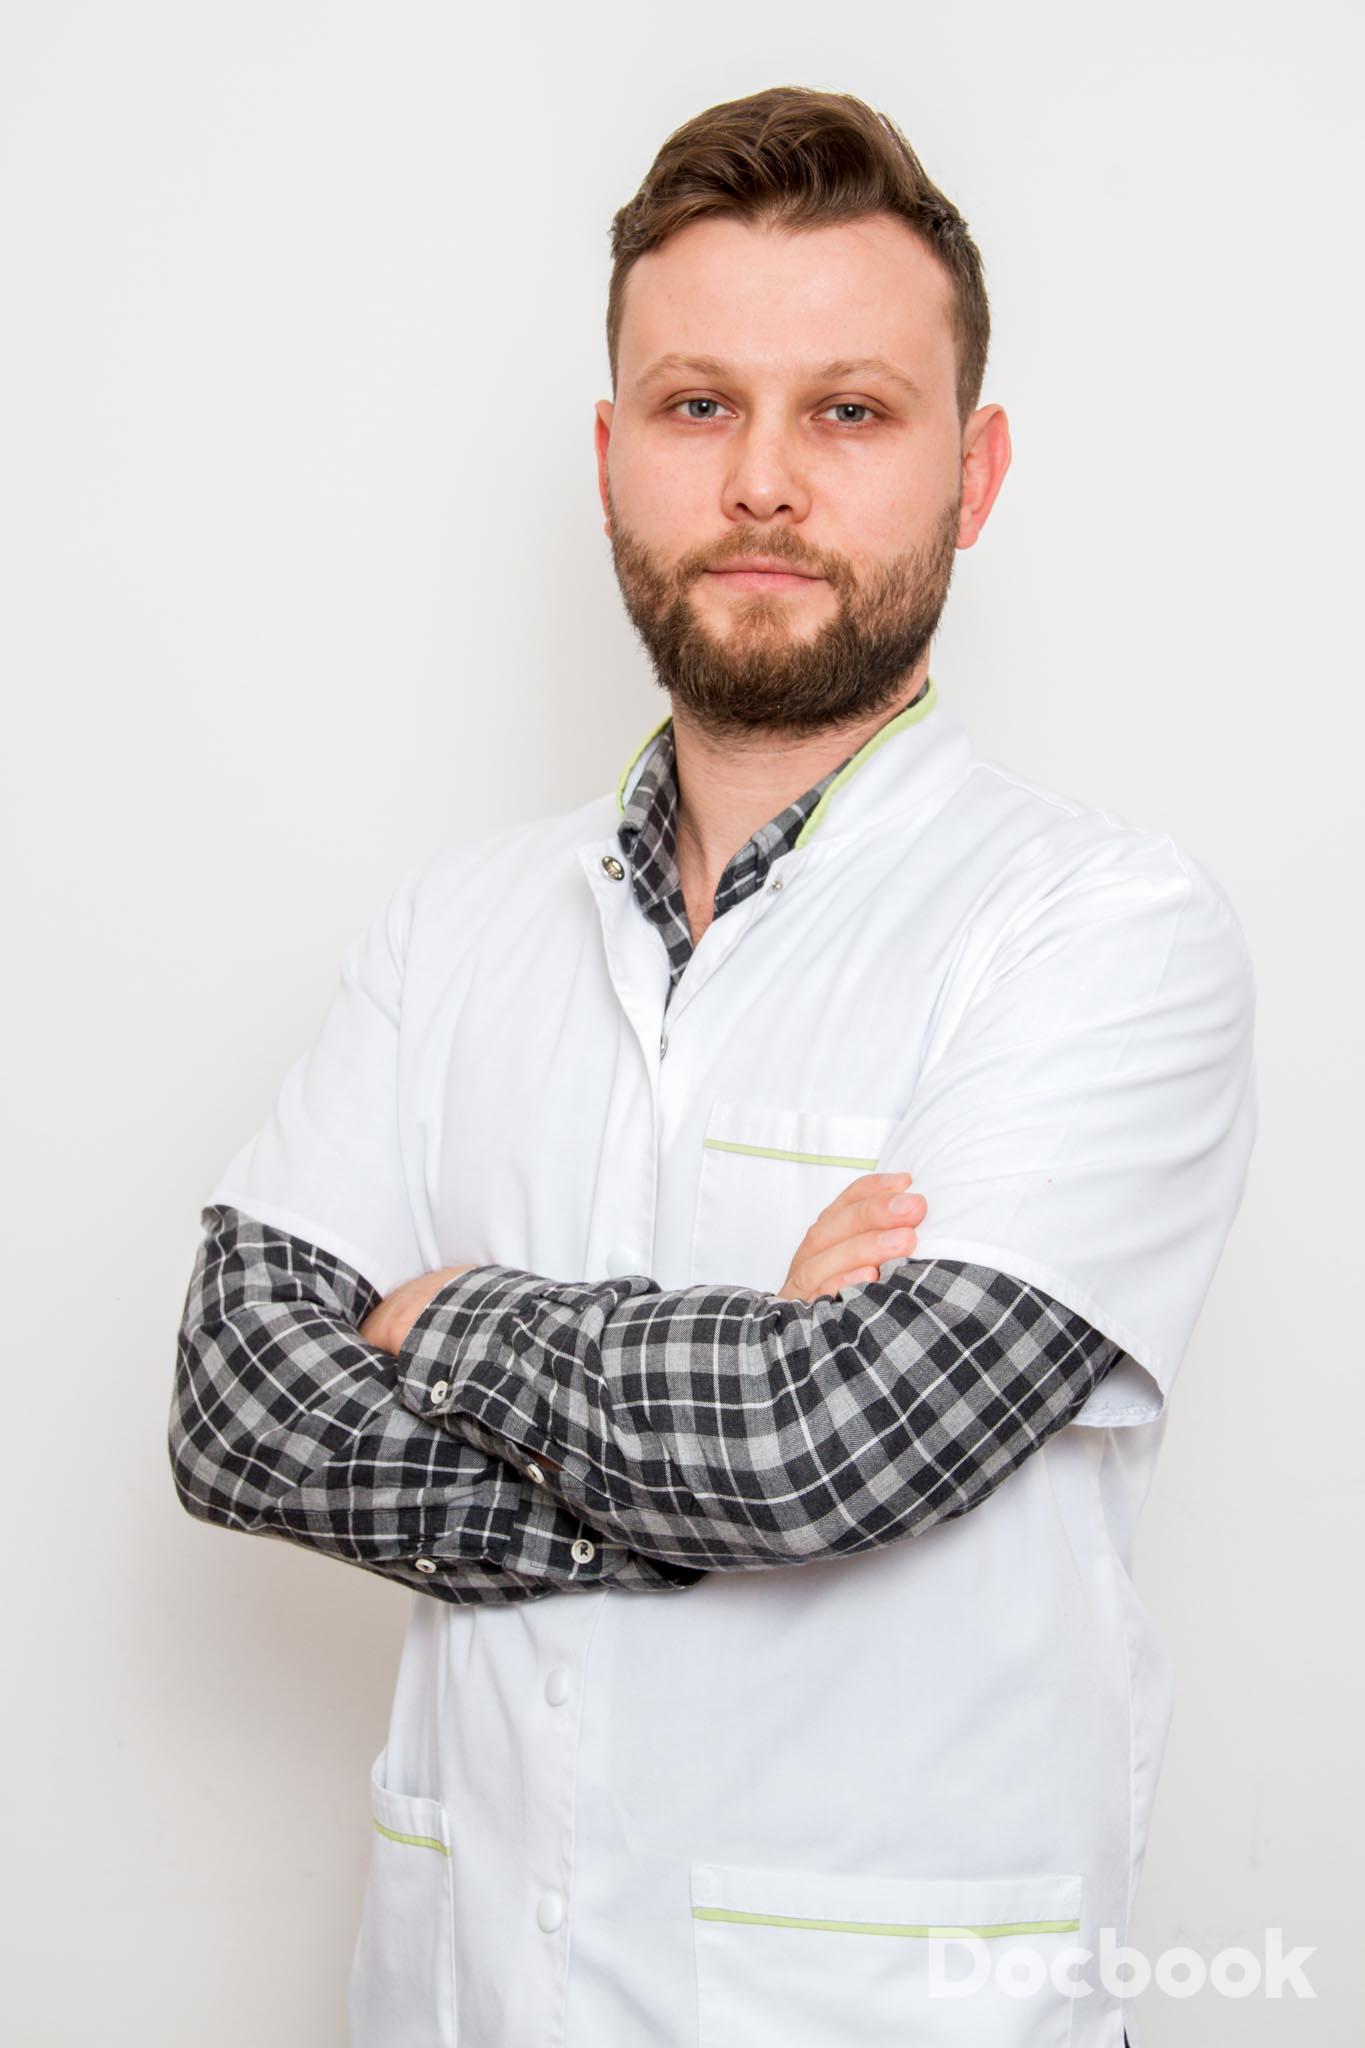 Dr.  Zaporojan Mihai